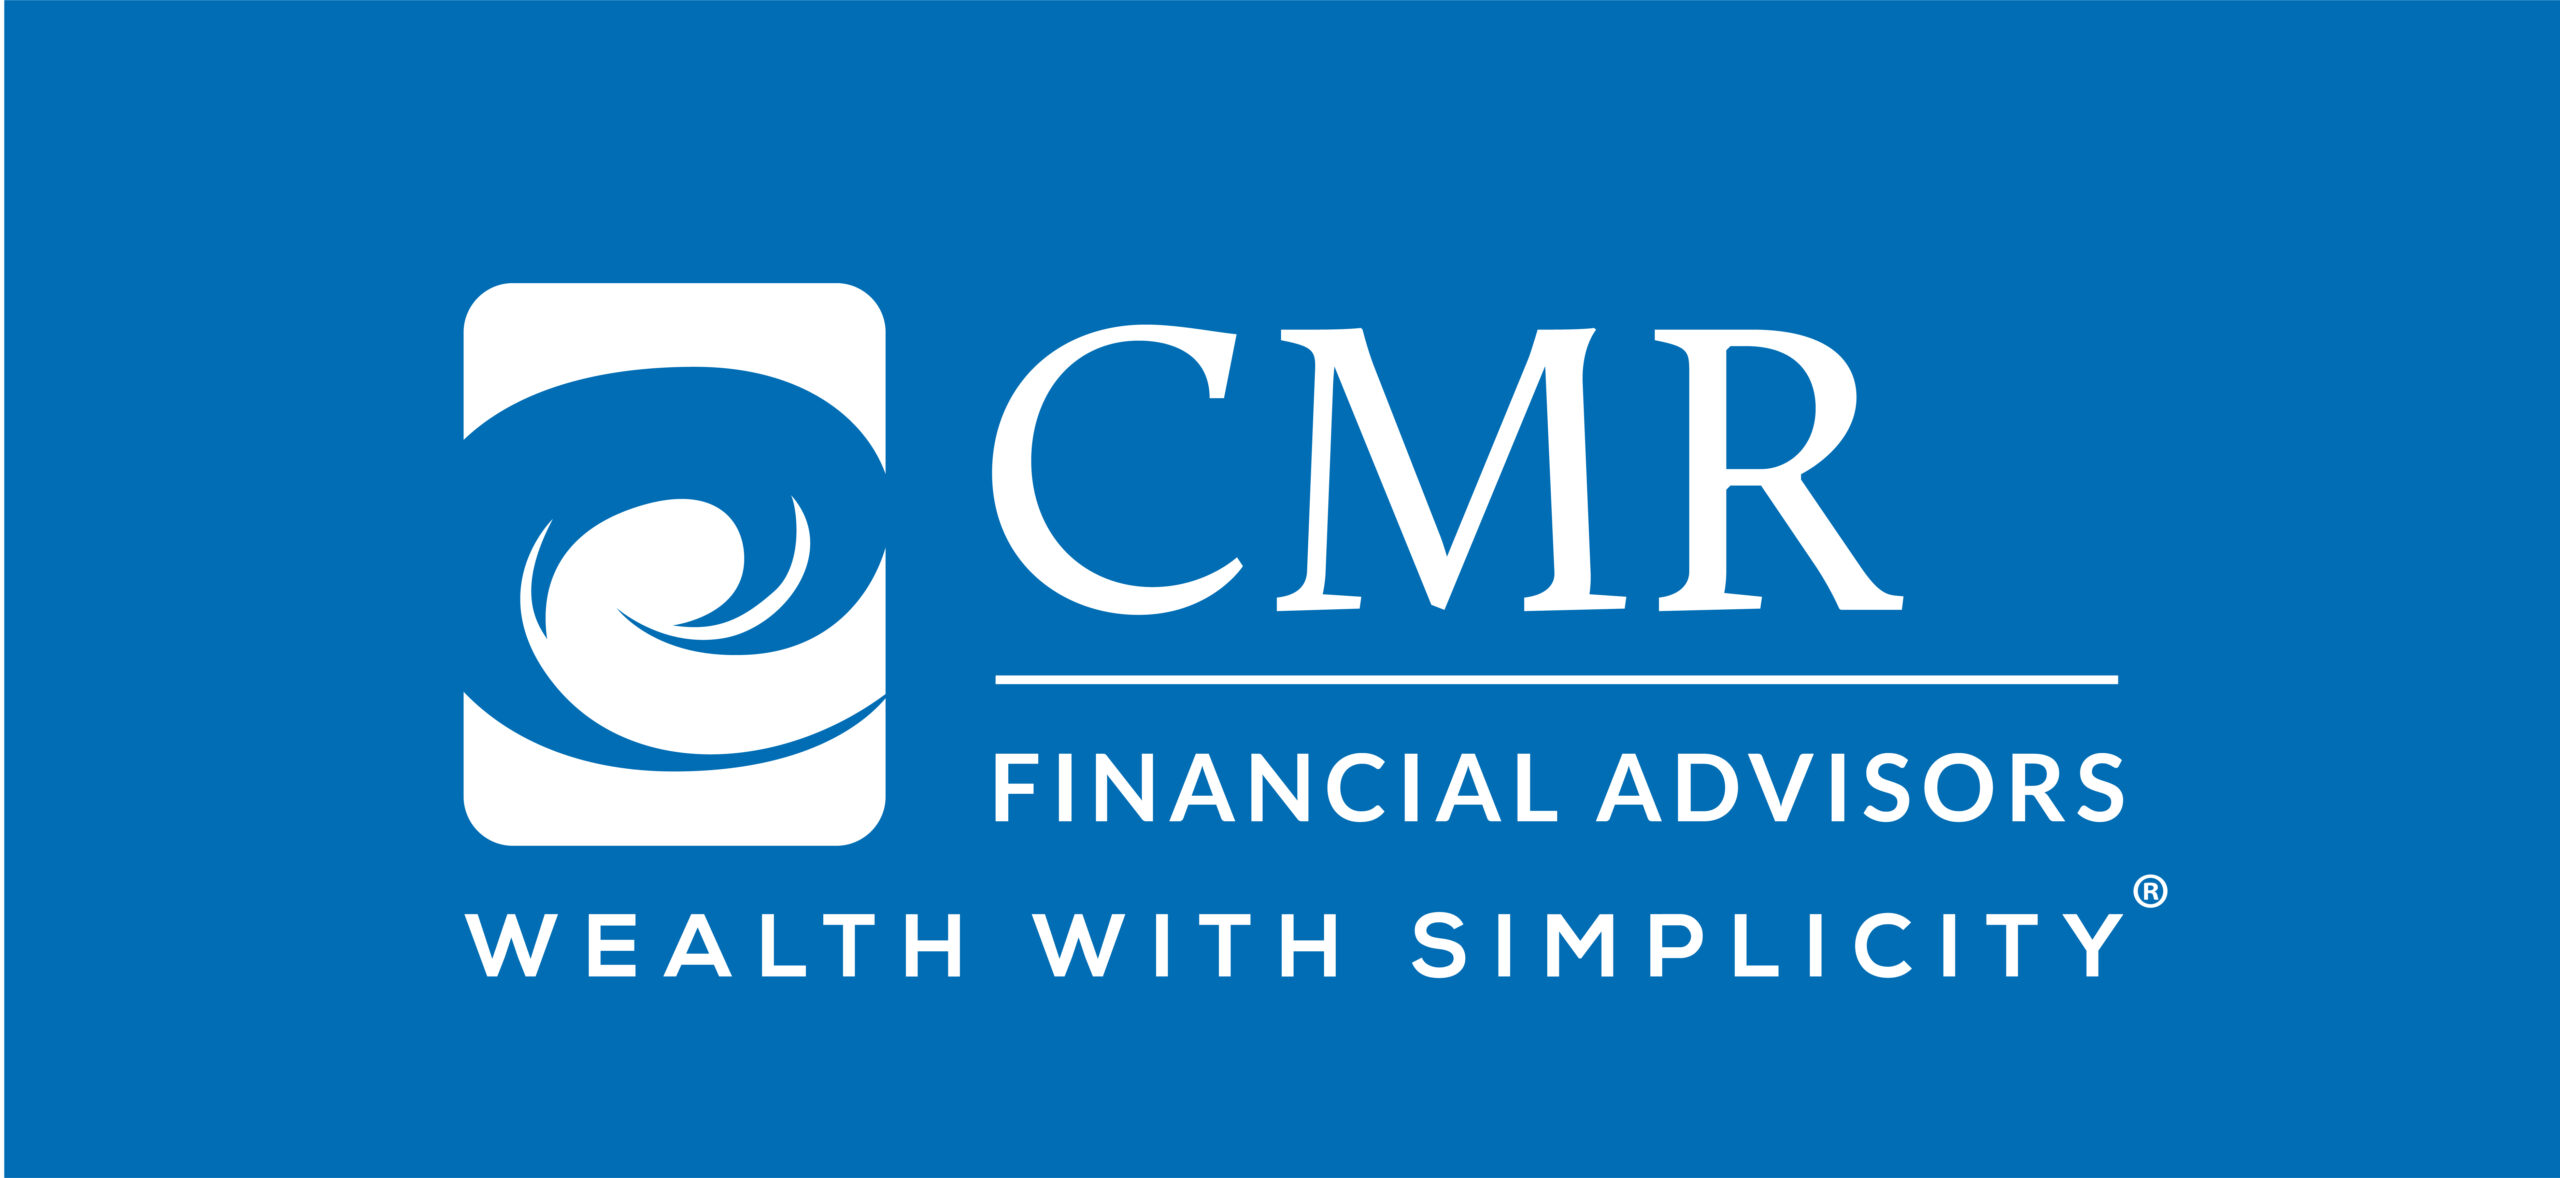 CMR Financial Advisor, Inc.